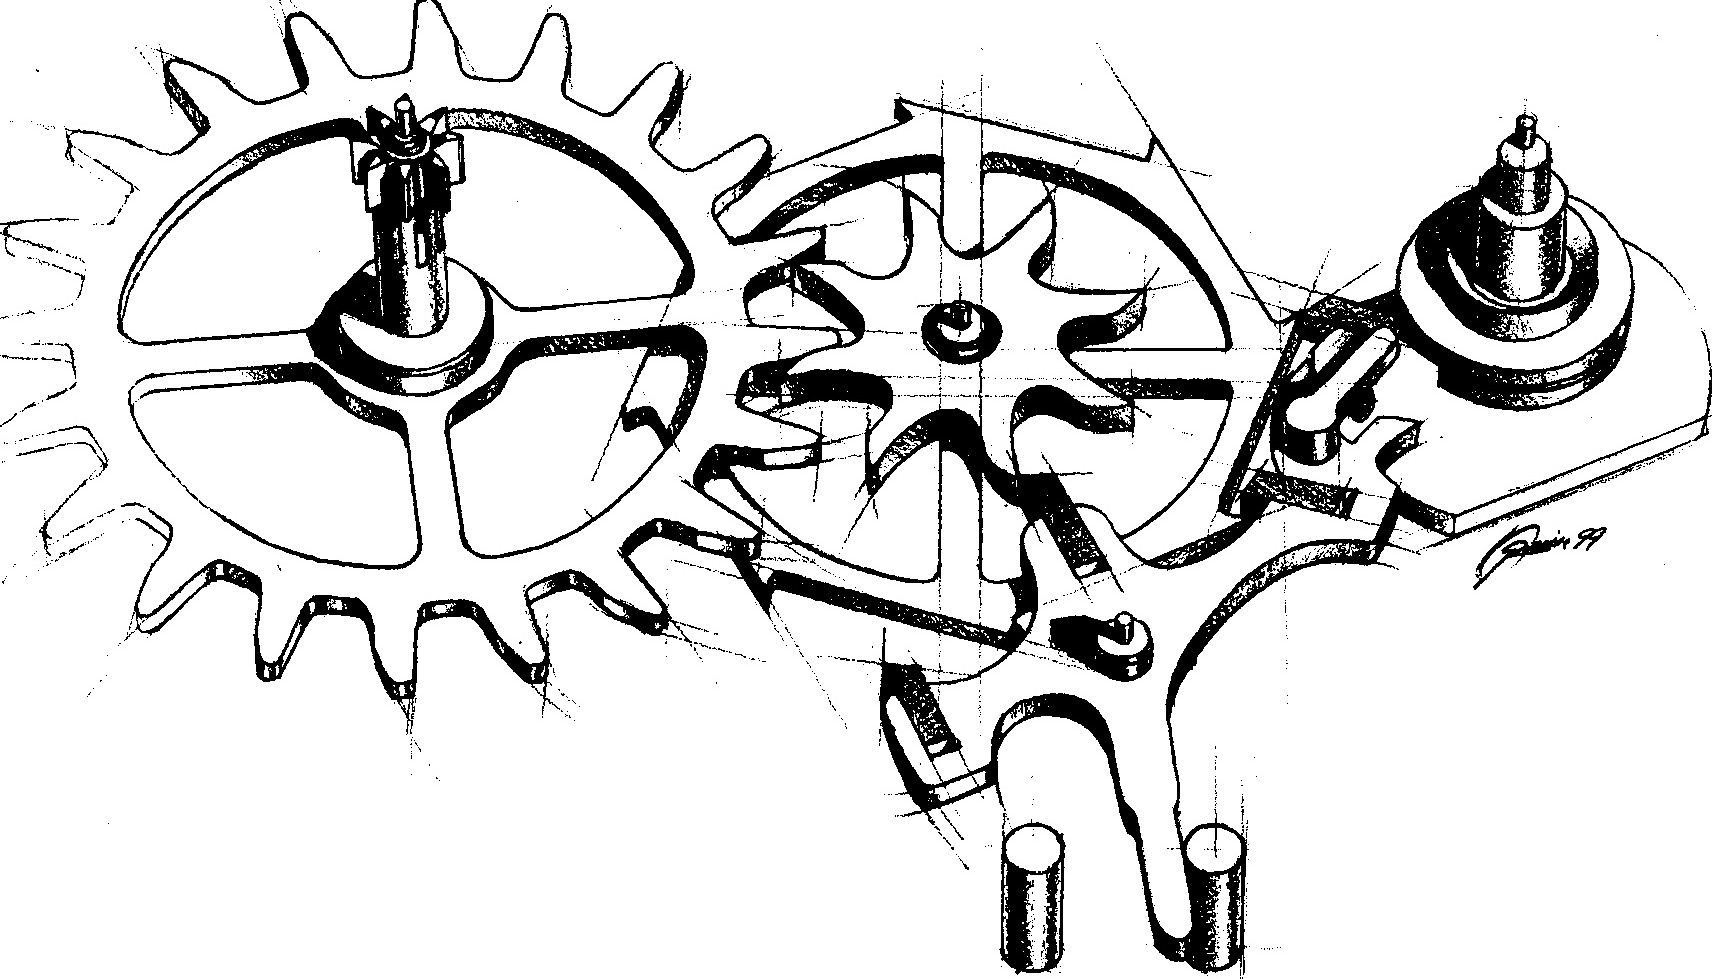 Sketch of George Daniels' co-axial escapement.